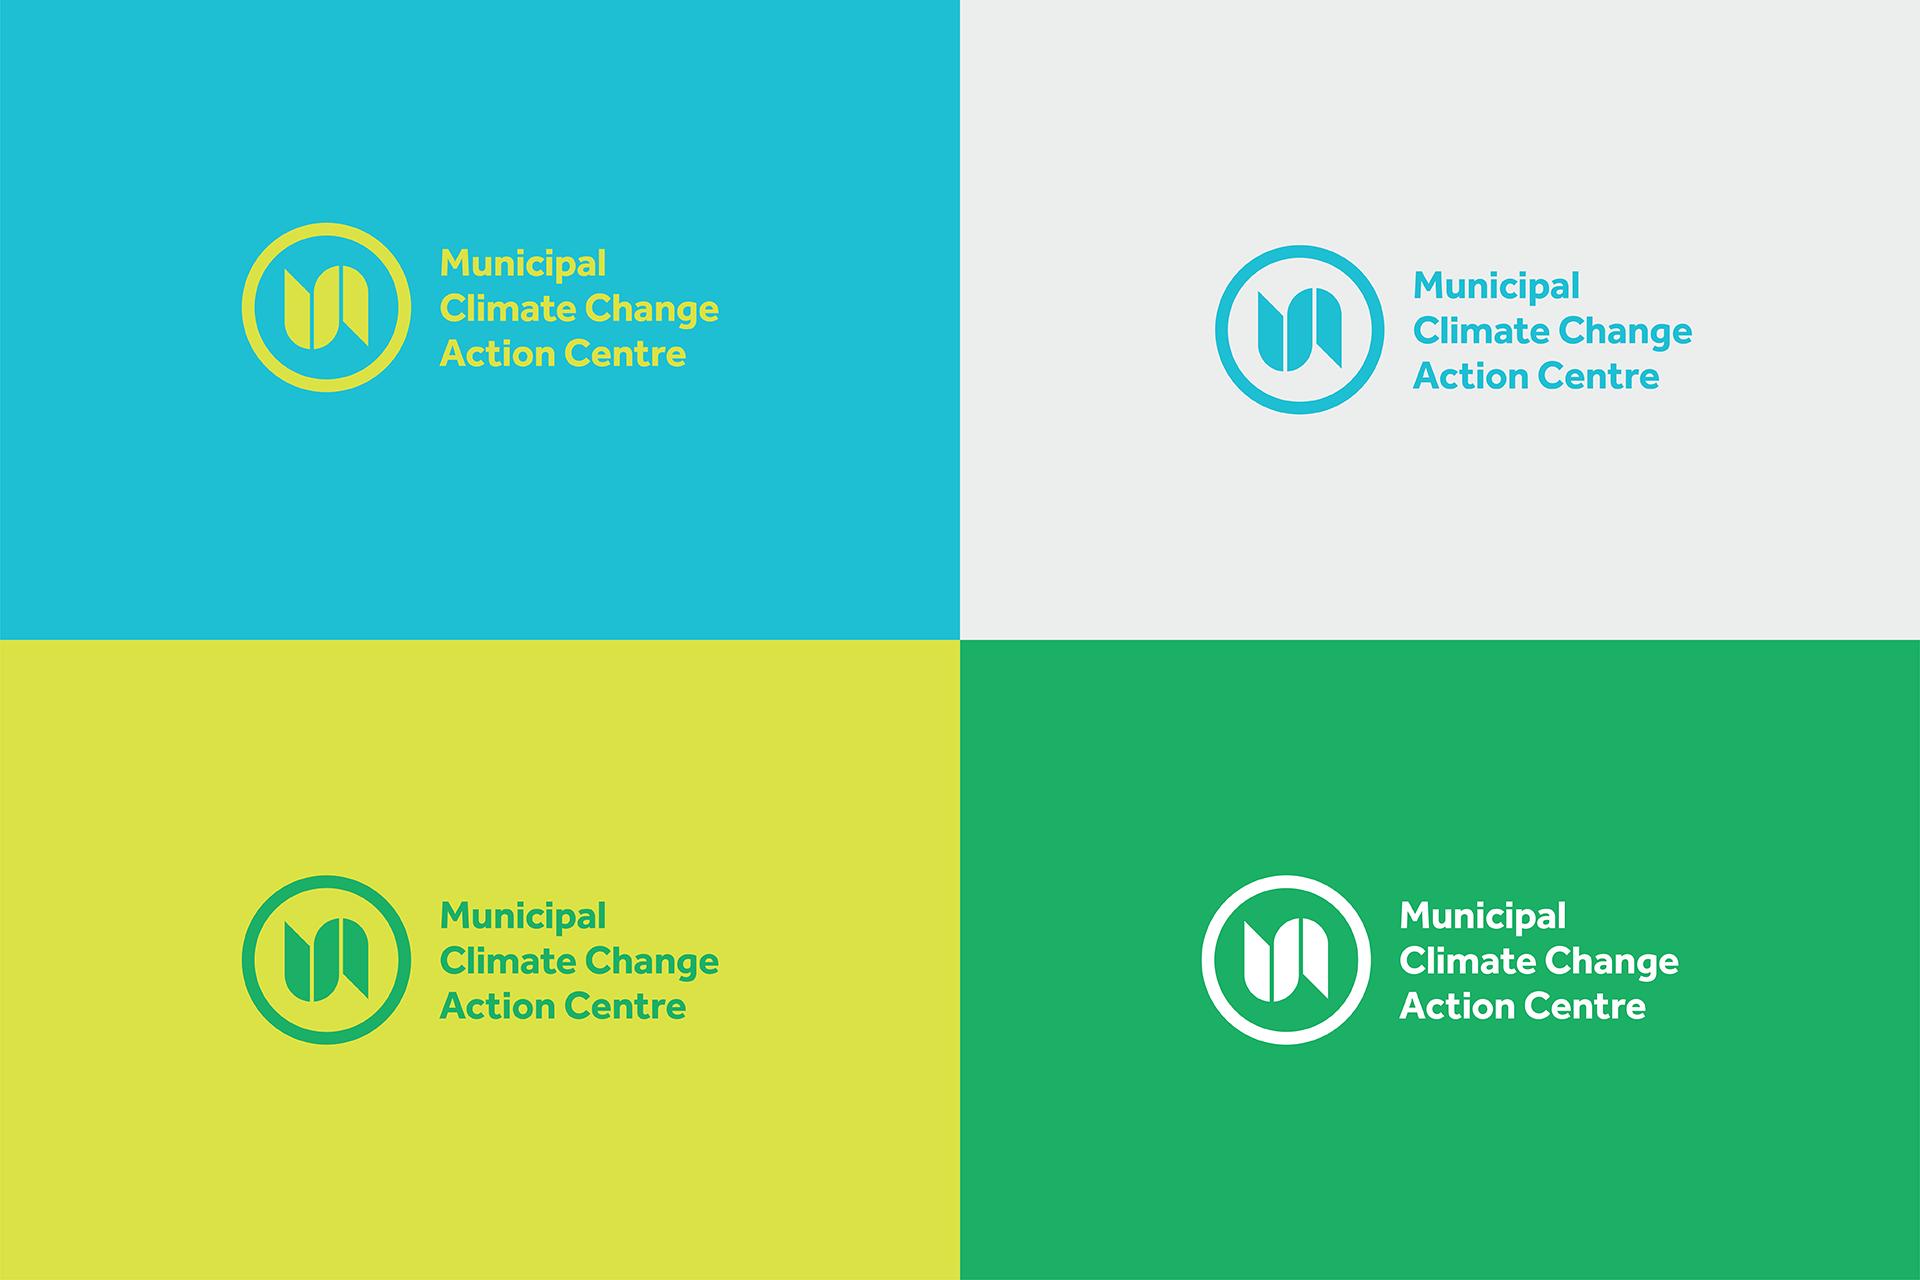 MCCAC-logo-website-02.png